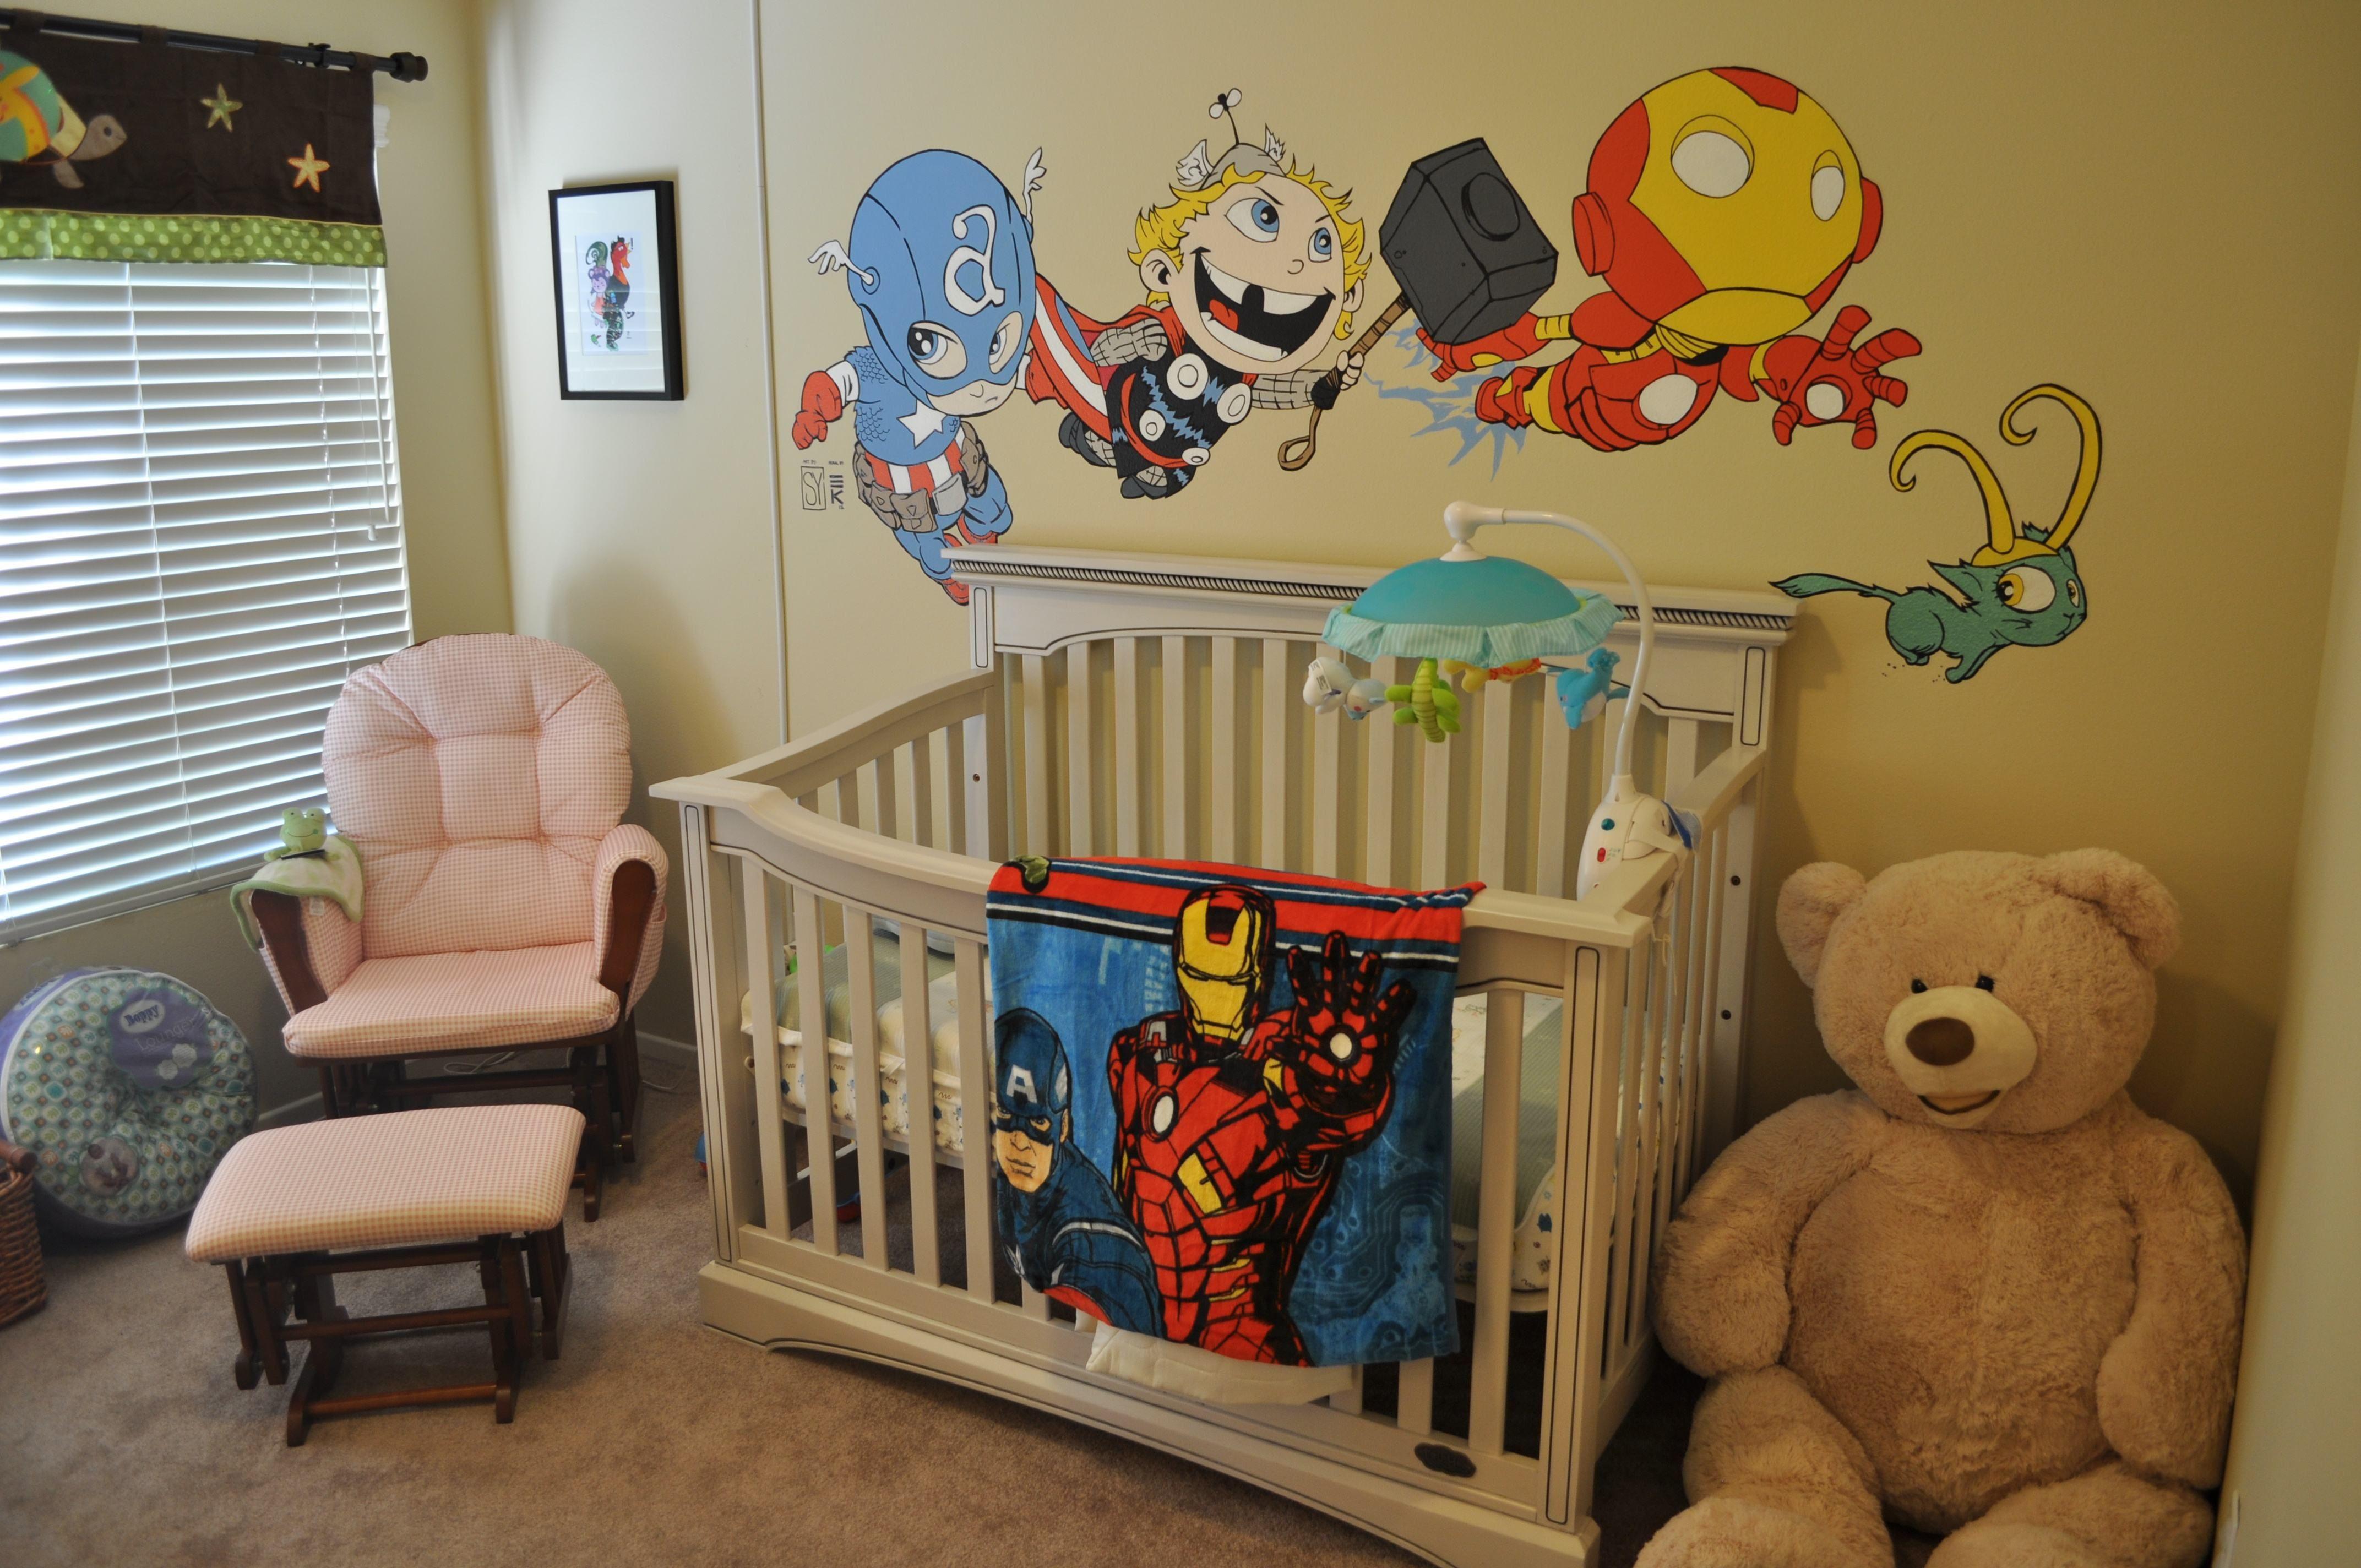 chibi marvel baby   avengers babies mural   super hero fun   pinterest